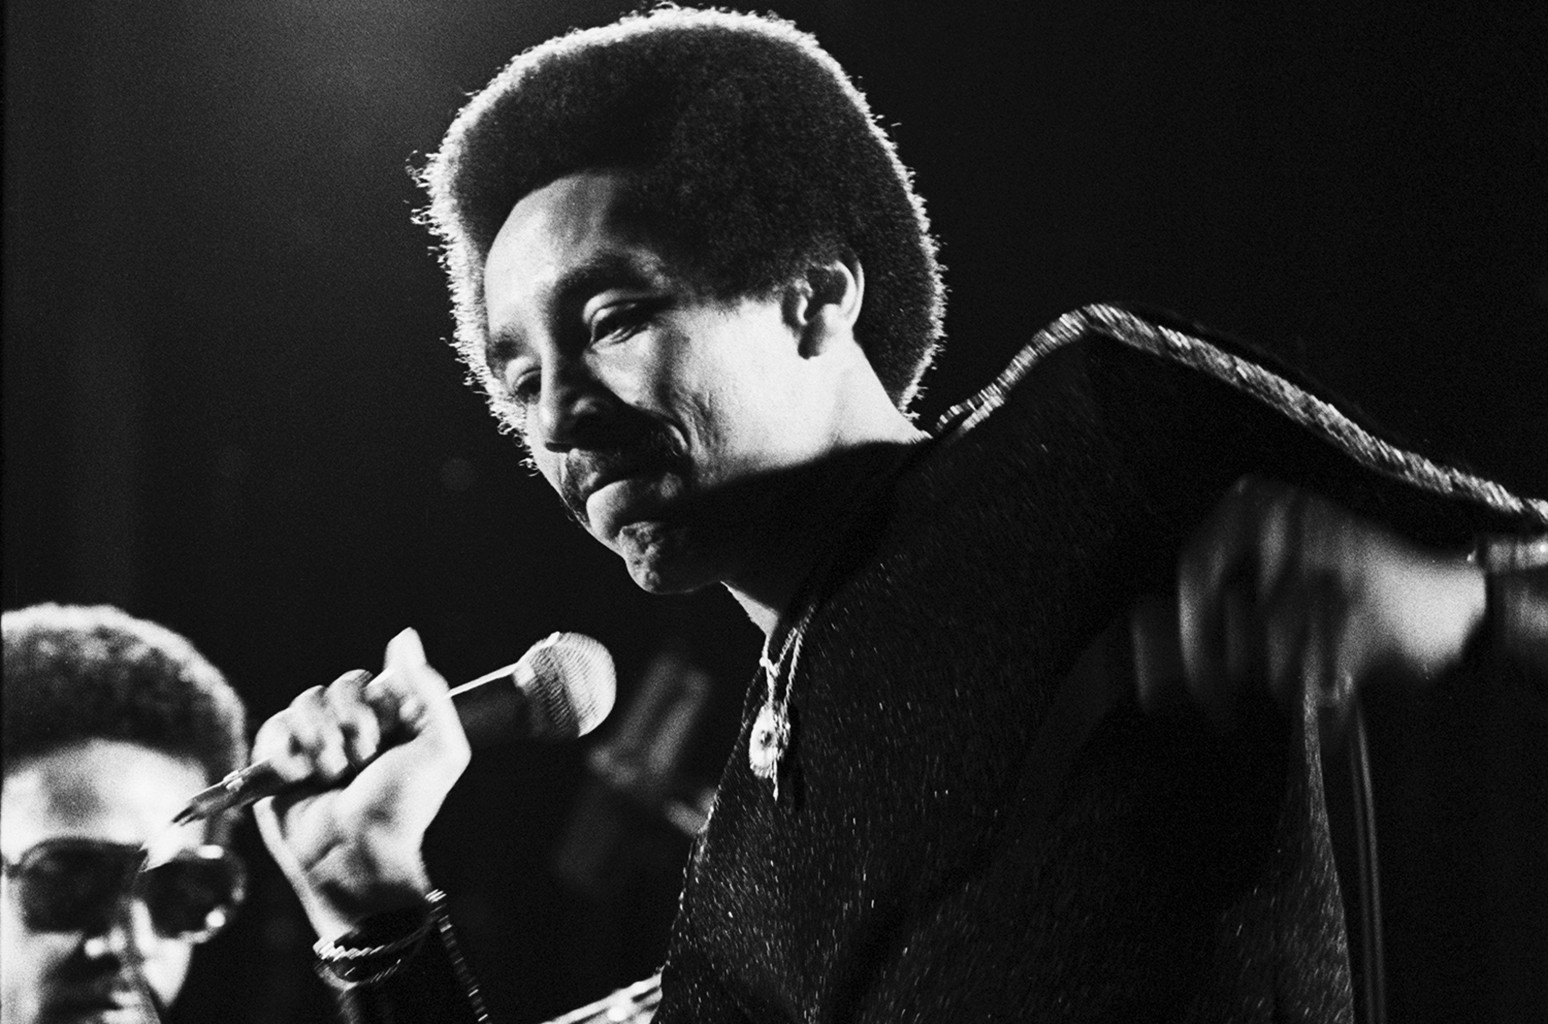 Smokey Robinson performing in 1975.